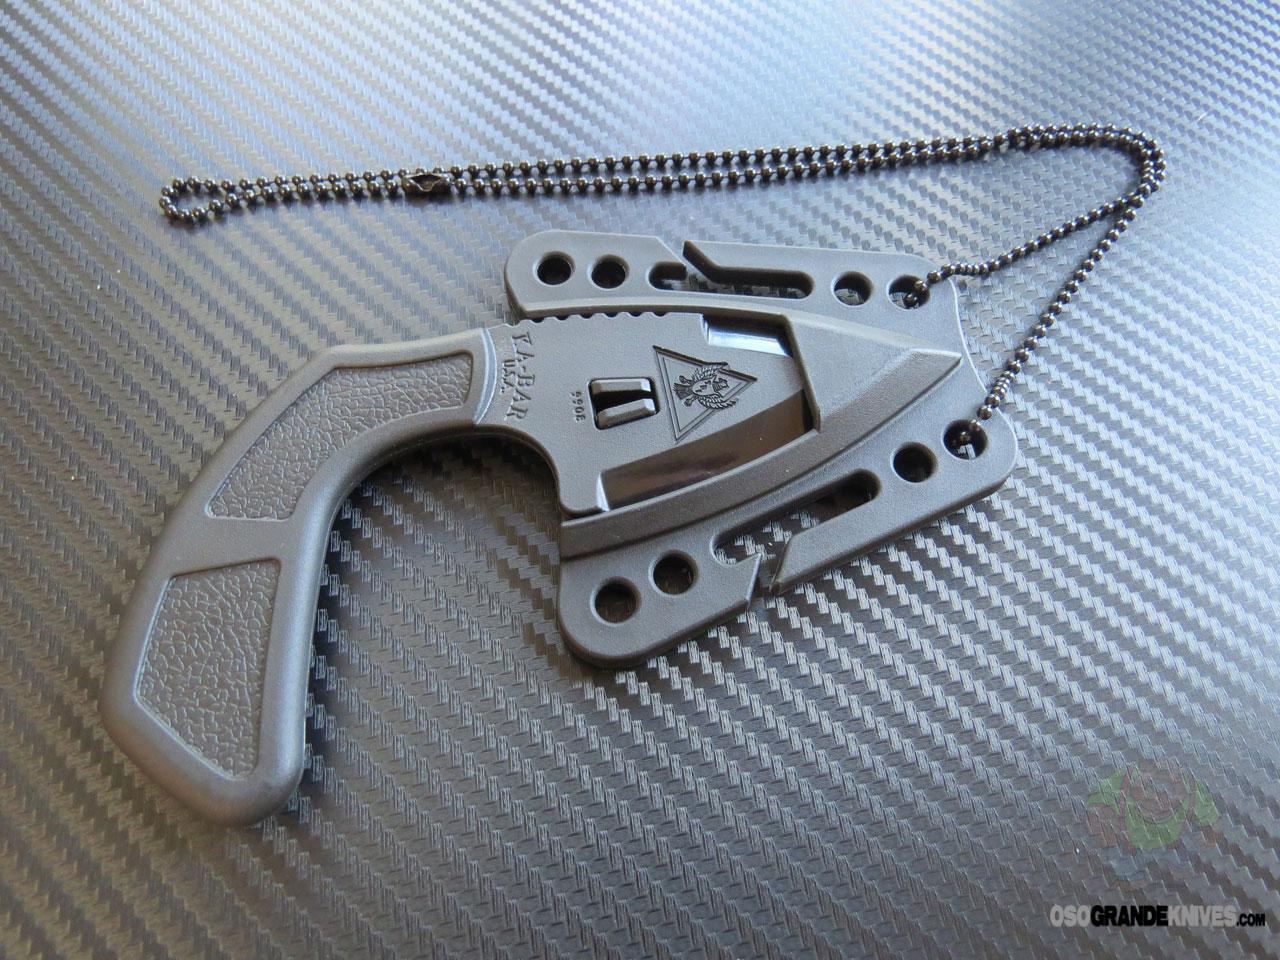 Ka Bar Tdi Shark Bite Fixed Blade Non Metalic Self Defense